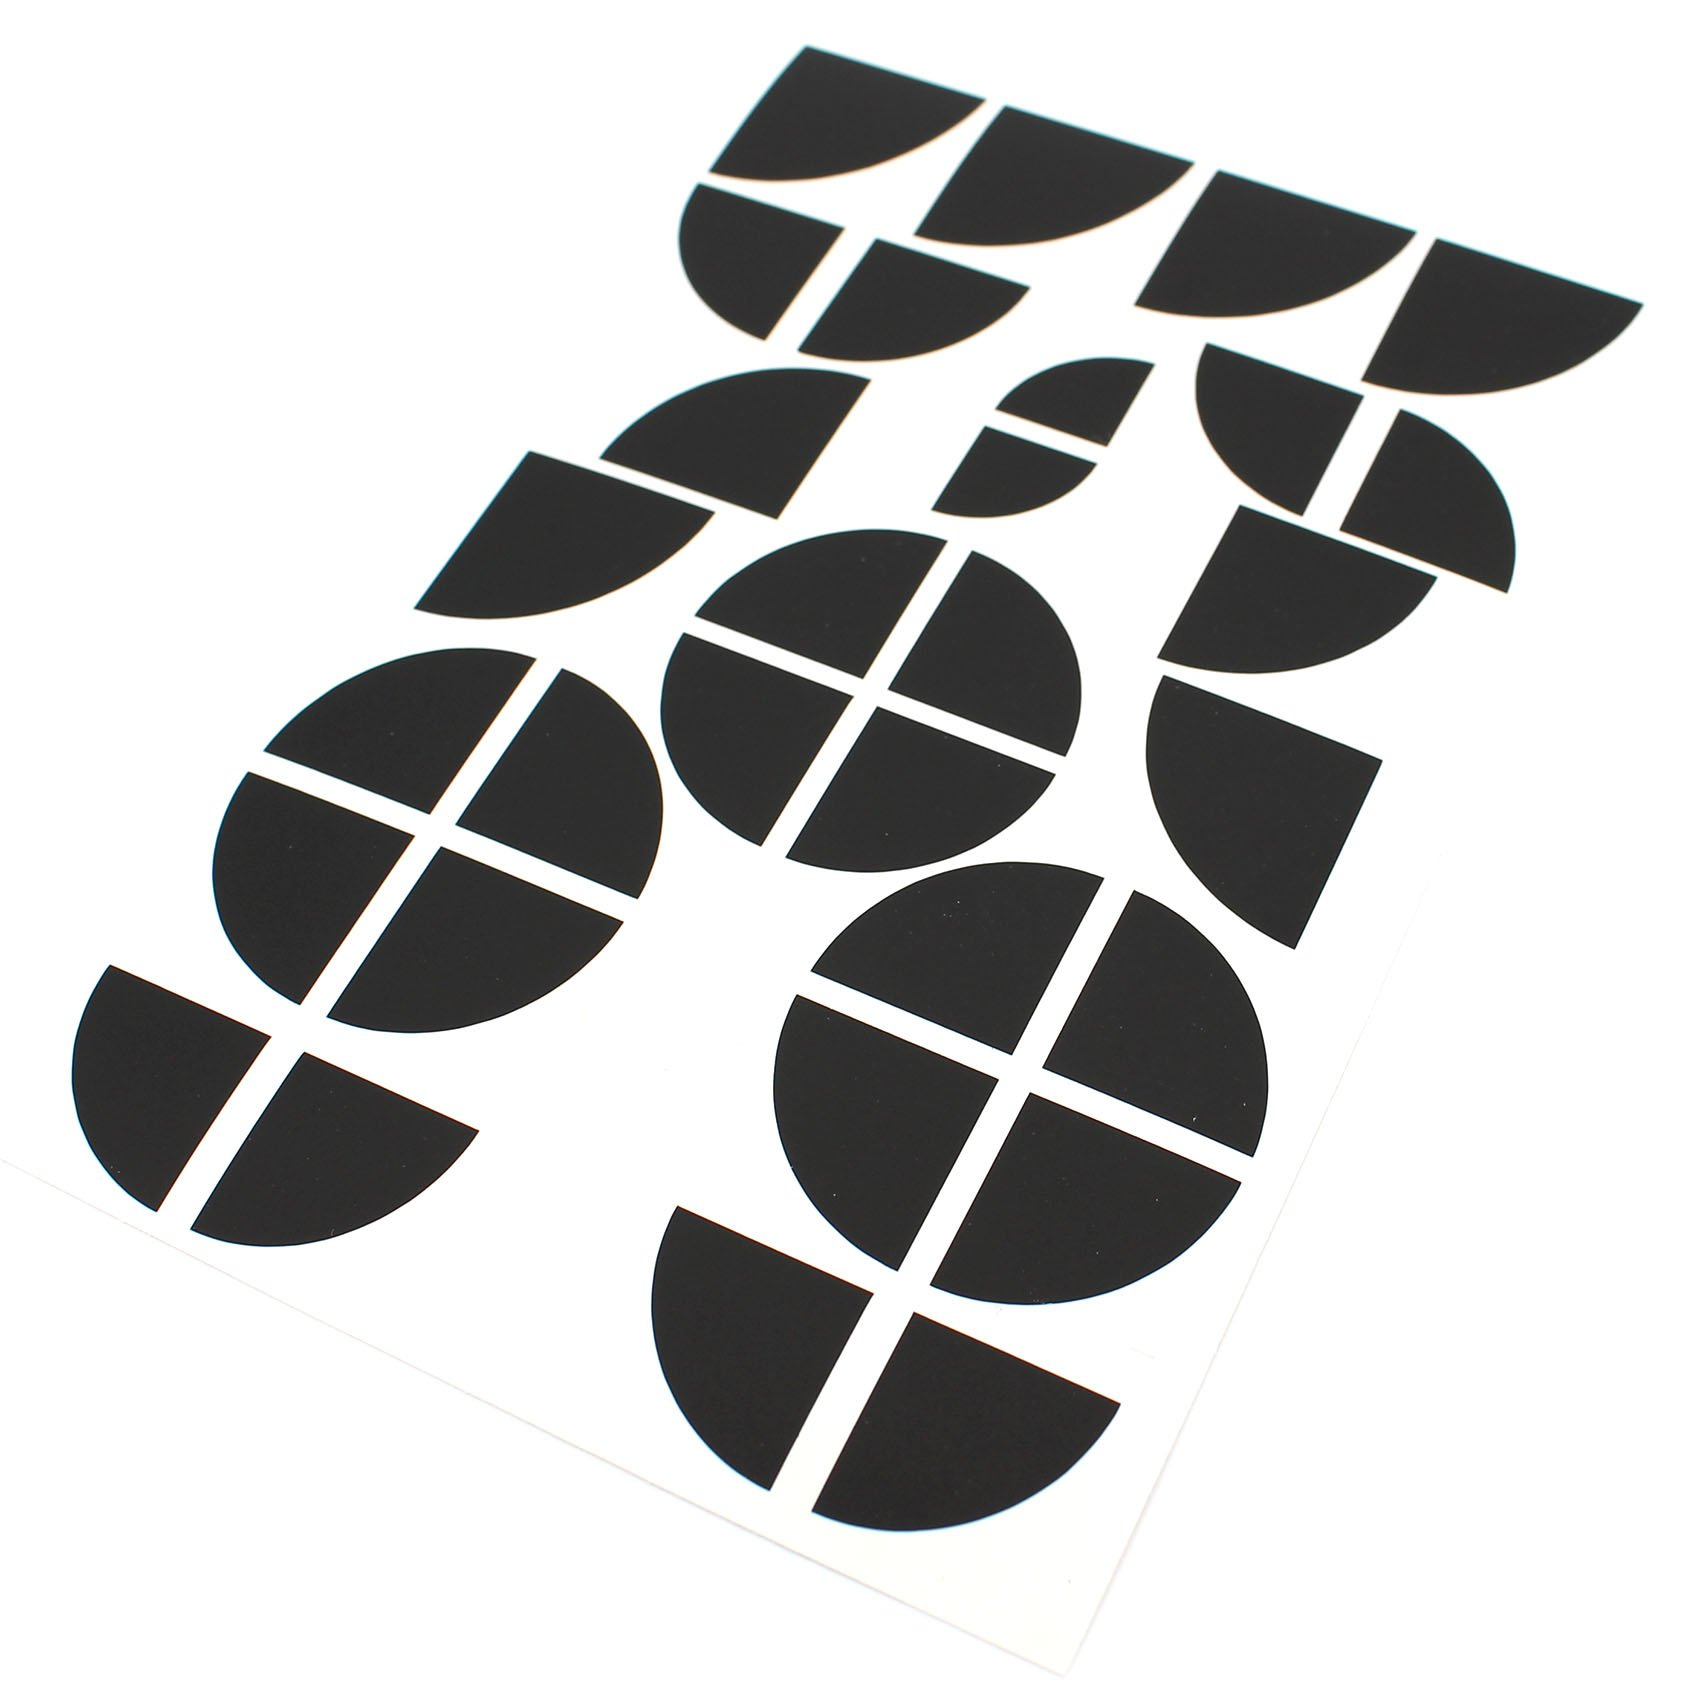 K105 .Schwarz Matt Finest-Folia Leon Schrifzug Folie f/ür Emblem Aufkleber